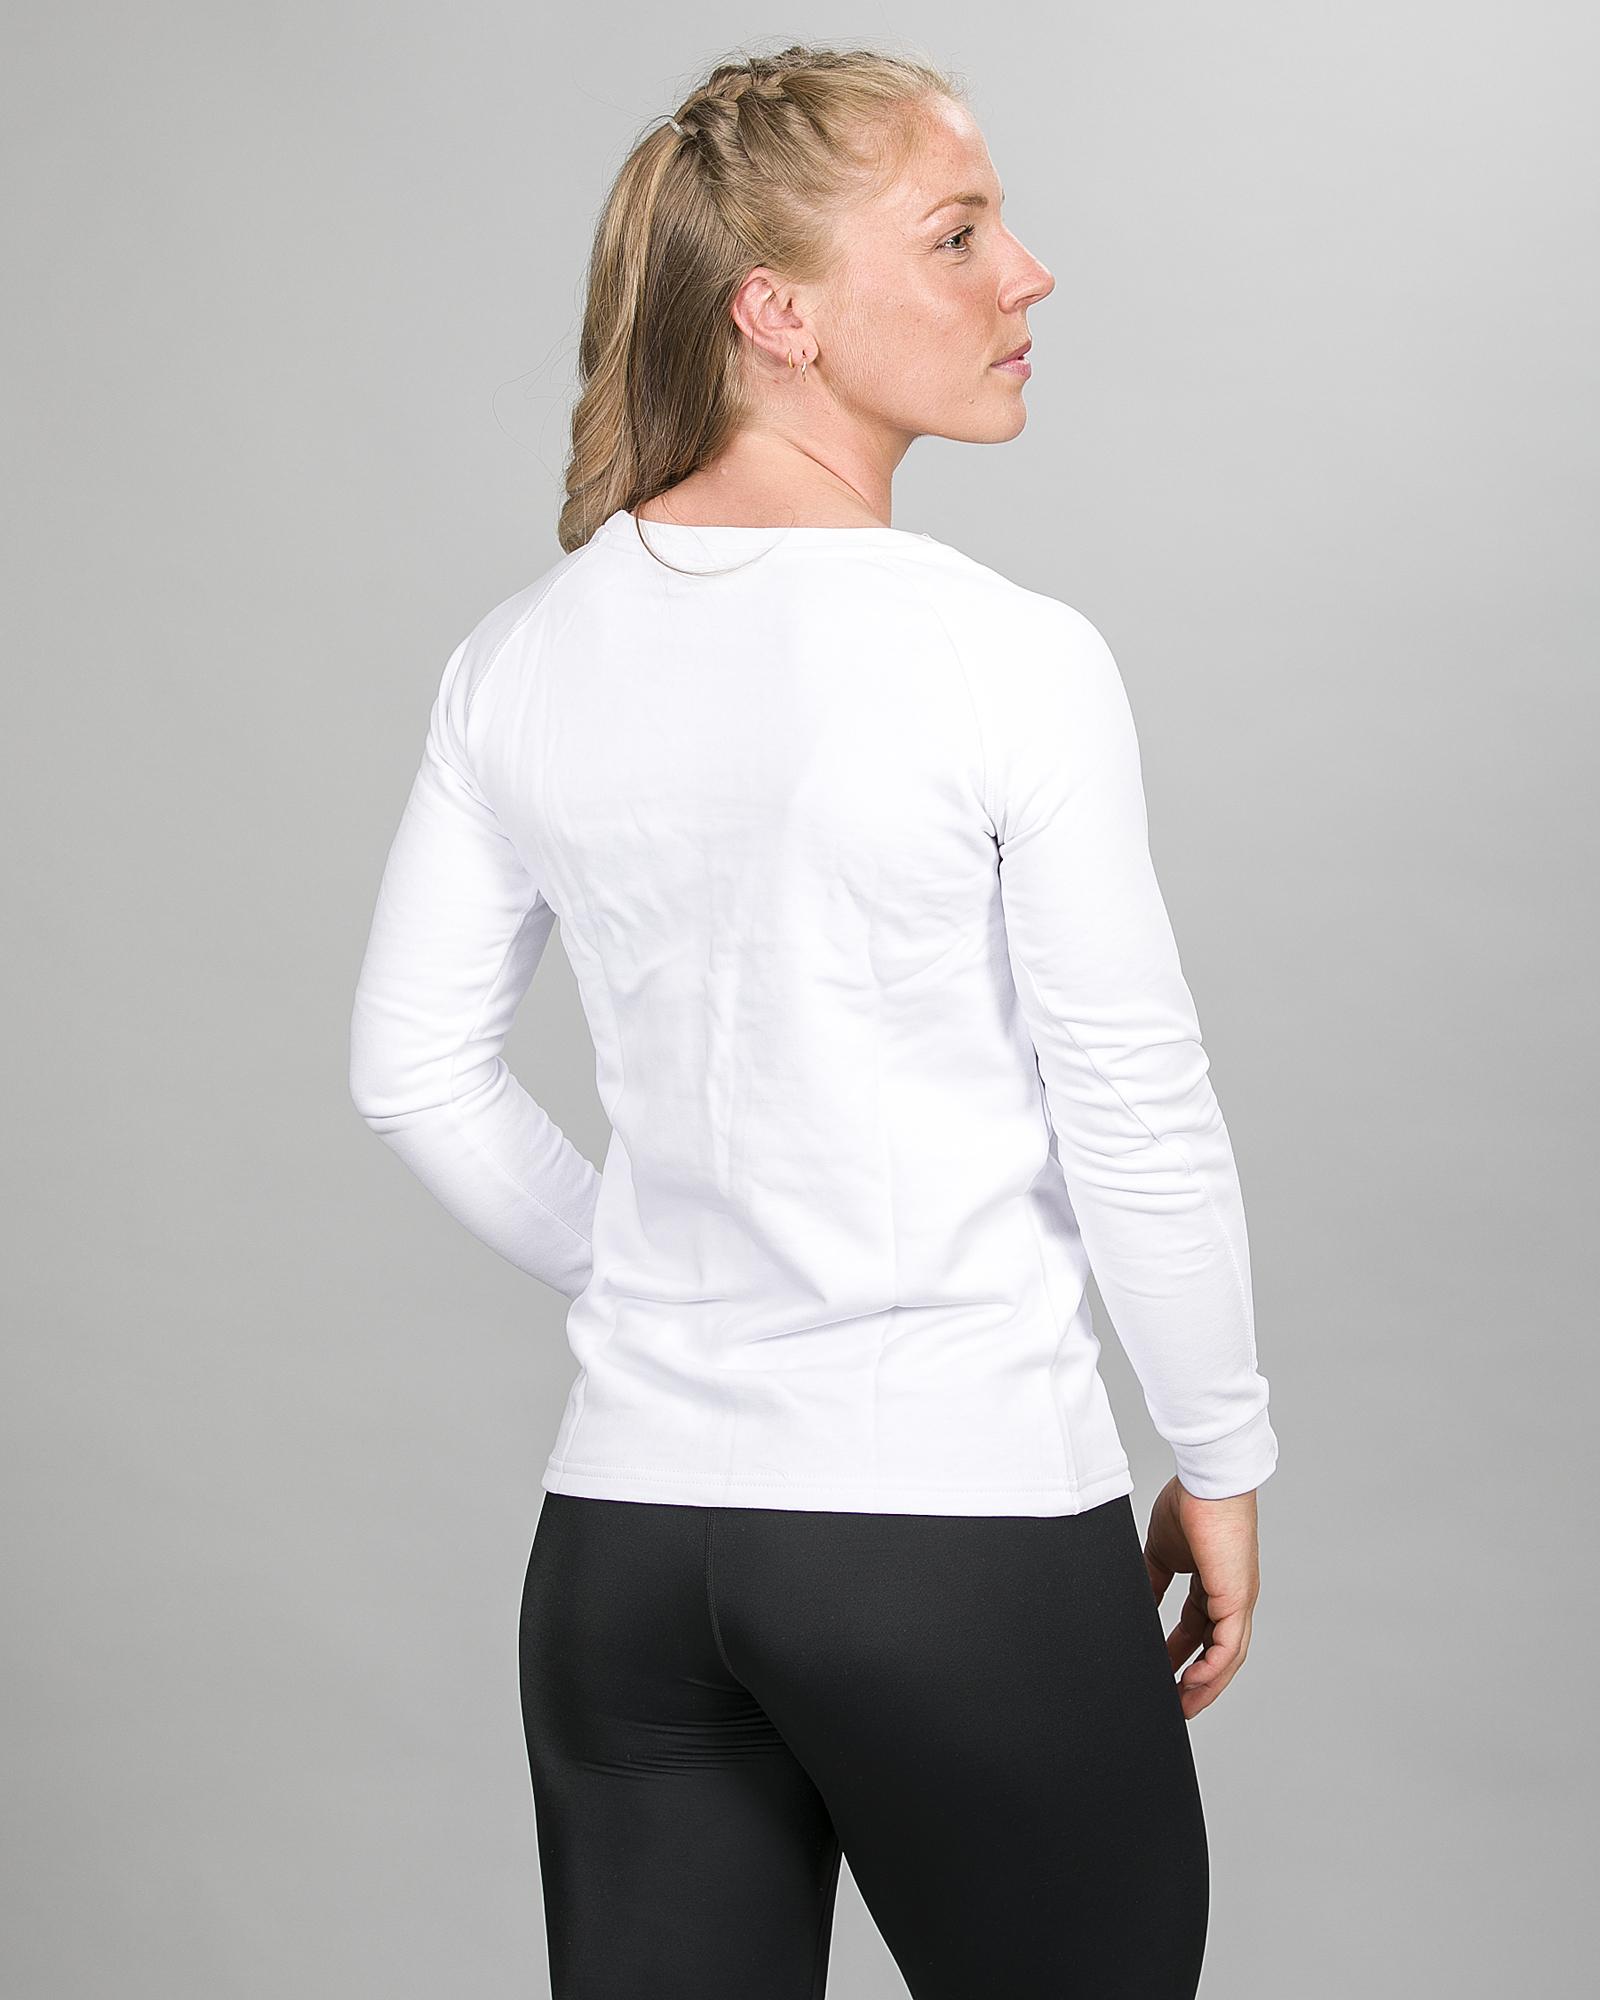 Aim'n White Sweatshirt 17050016 d